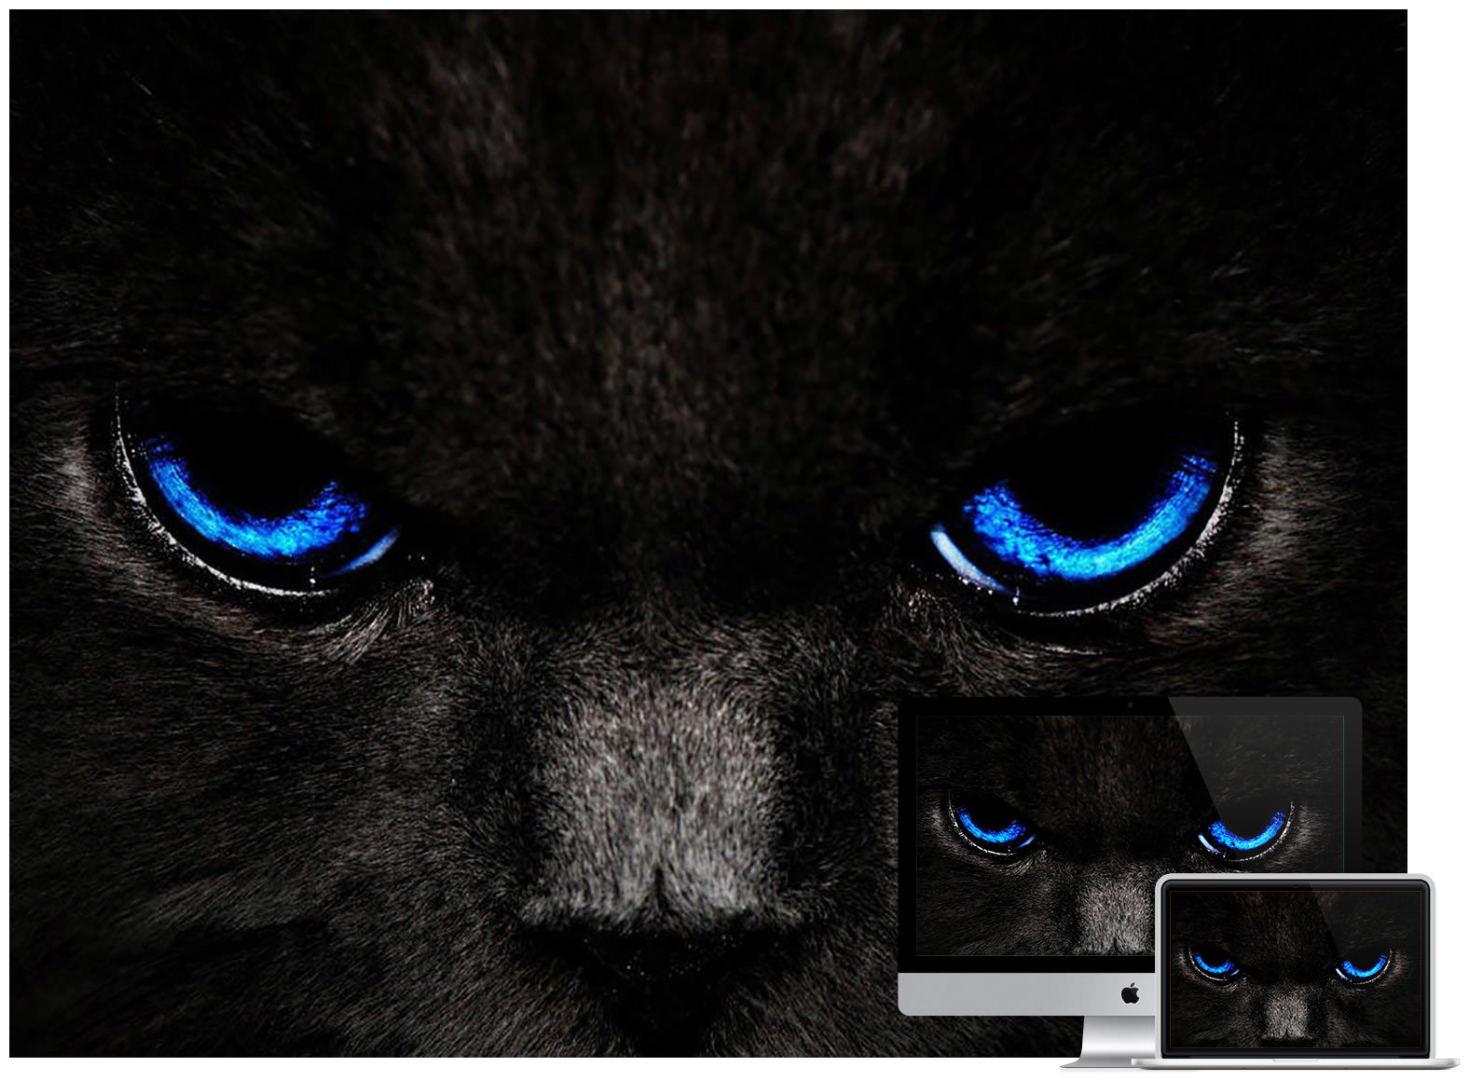 dark-cat-wallpaper